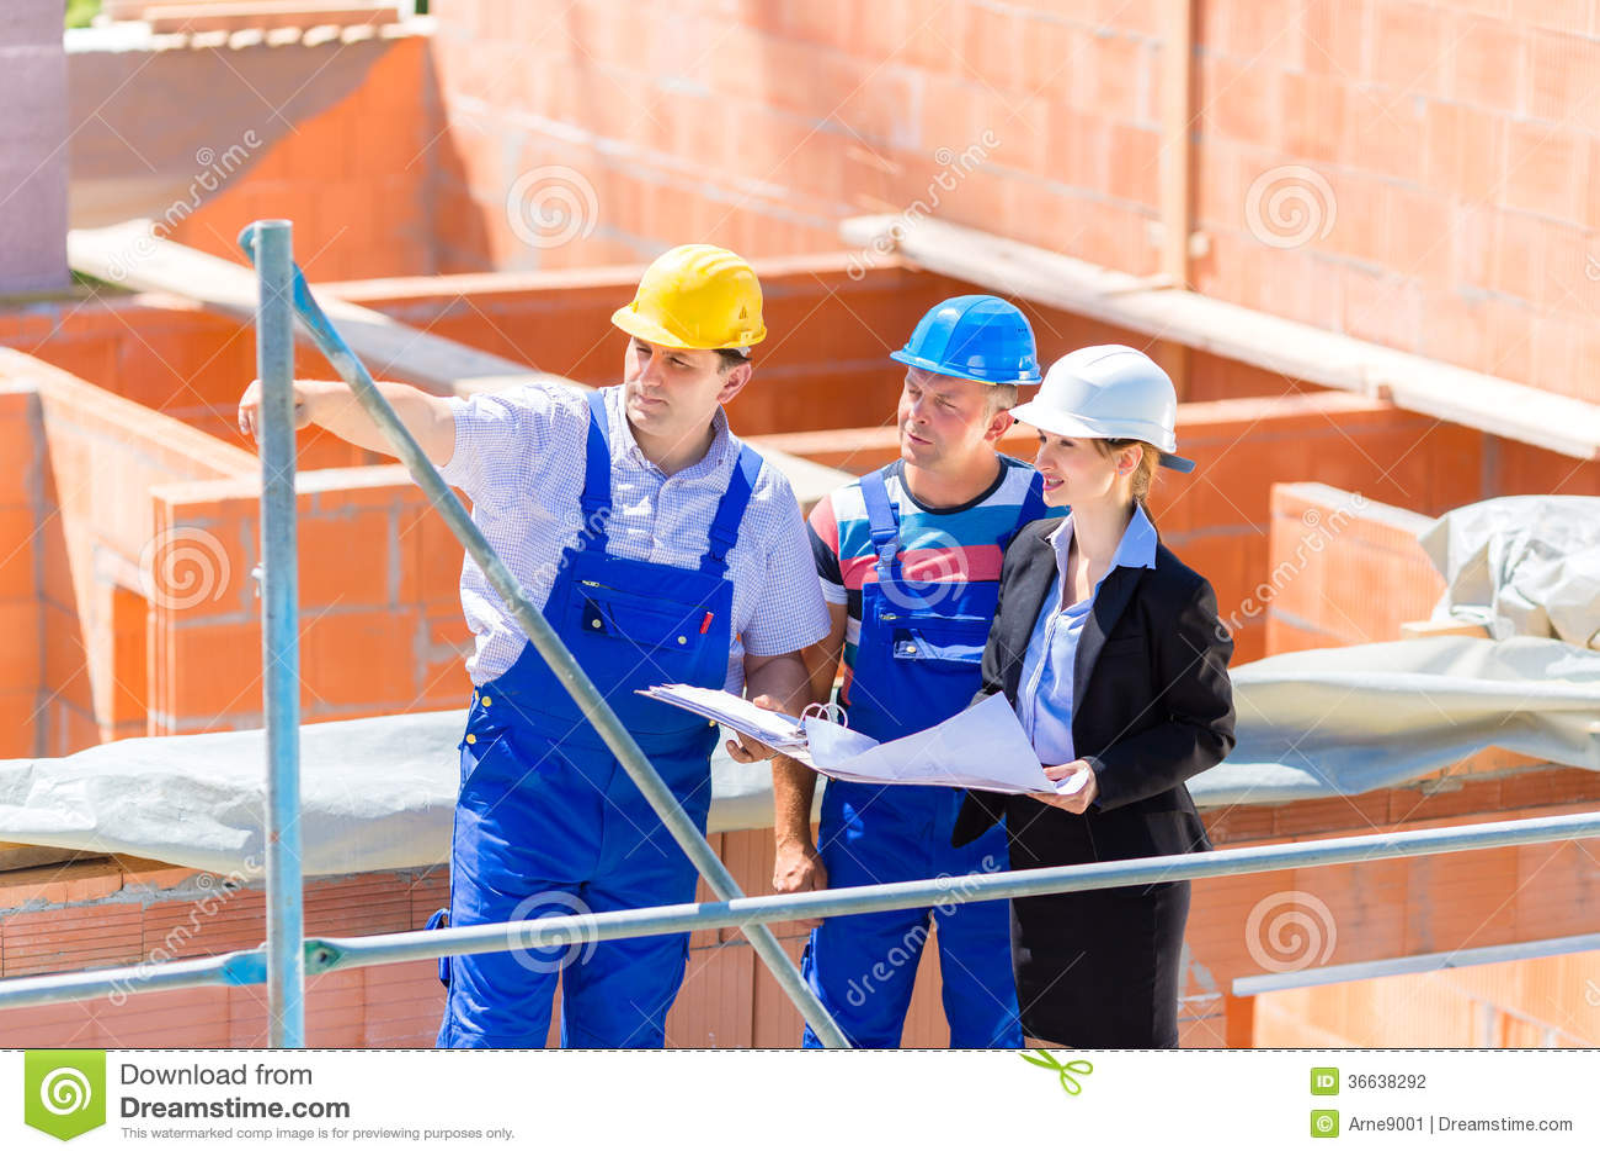 Team Discussing Construction Building Site Plans Stock